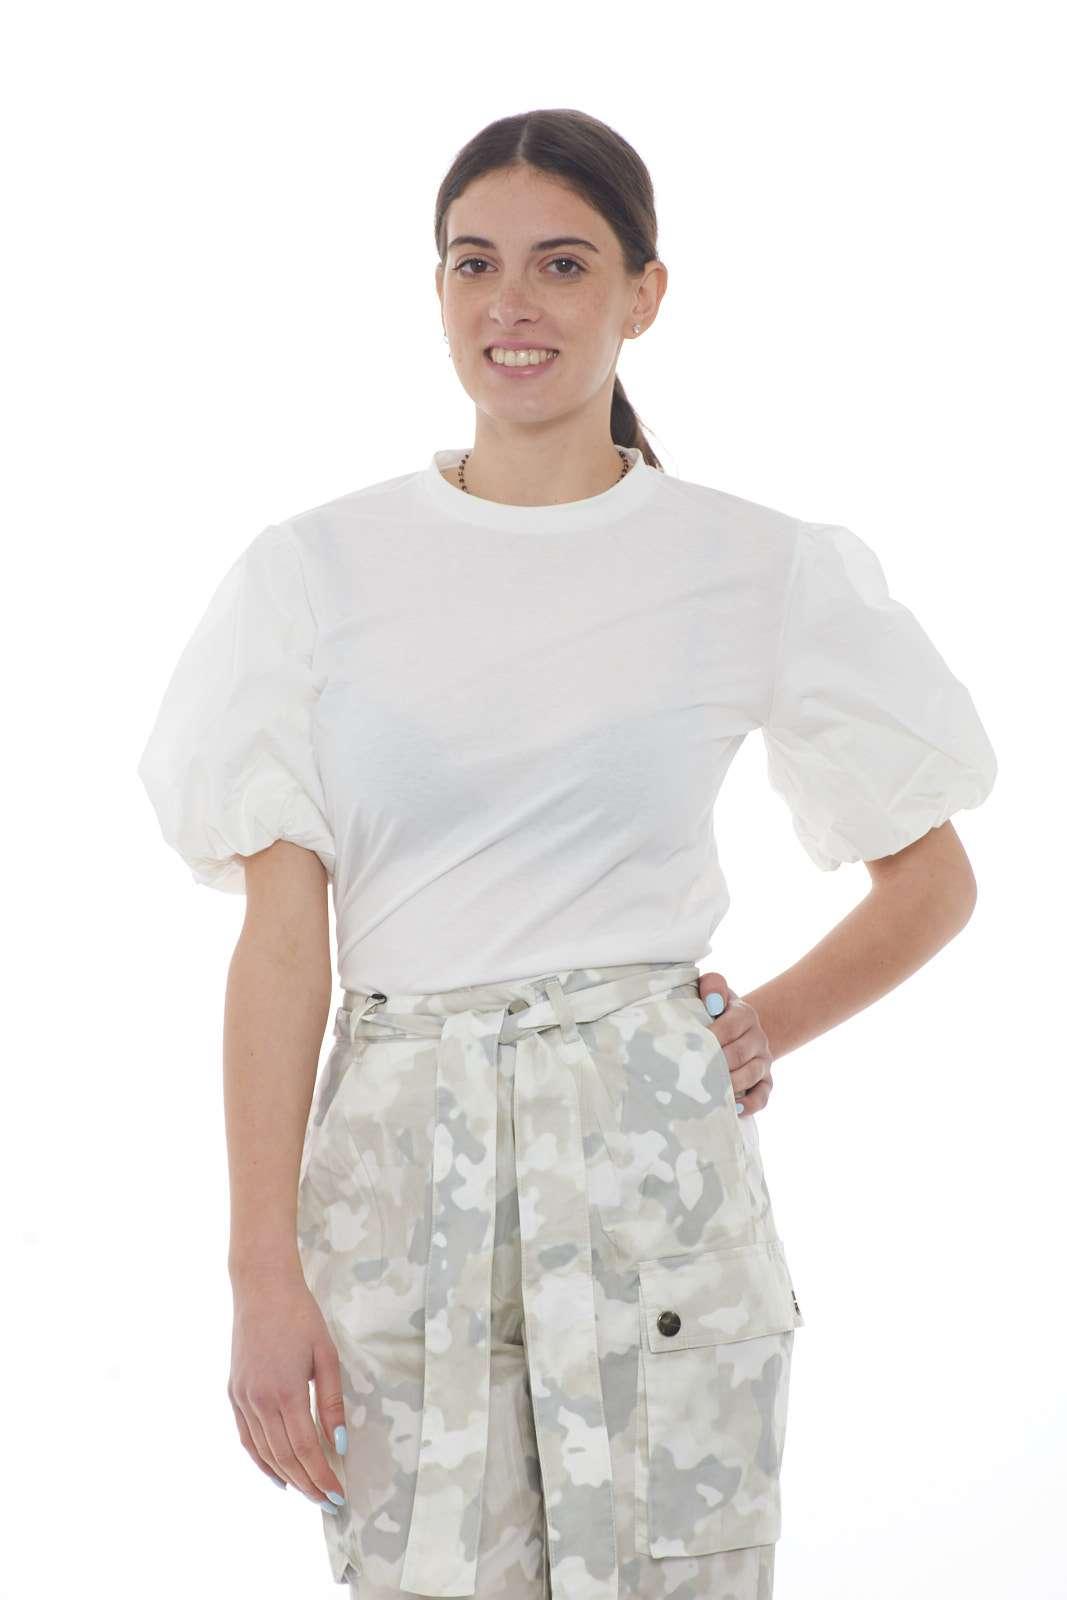 https://www.parmax.com/media/catalog/product/a/i/PE-outlet_parmax-t-shirt-donna-Pinko-1b14gk-A.jpg